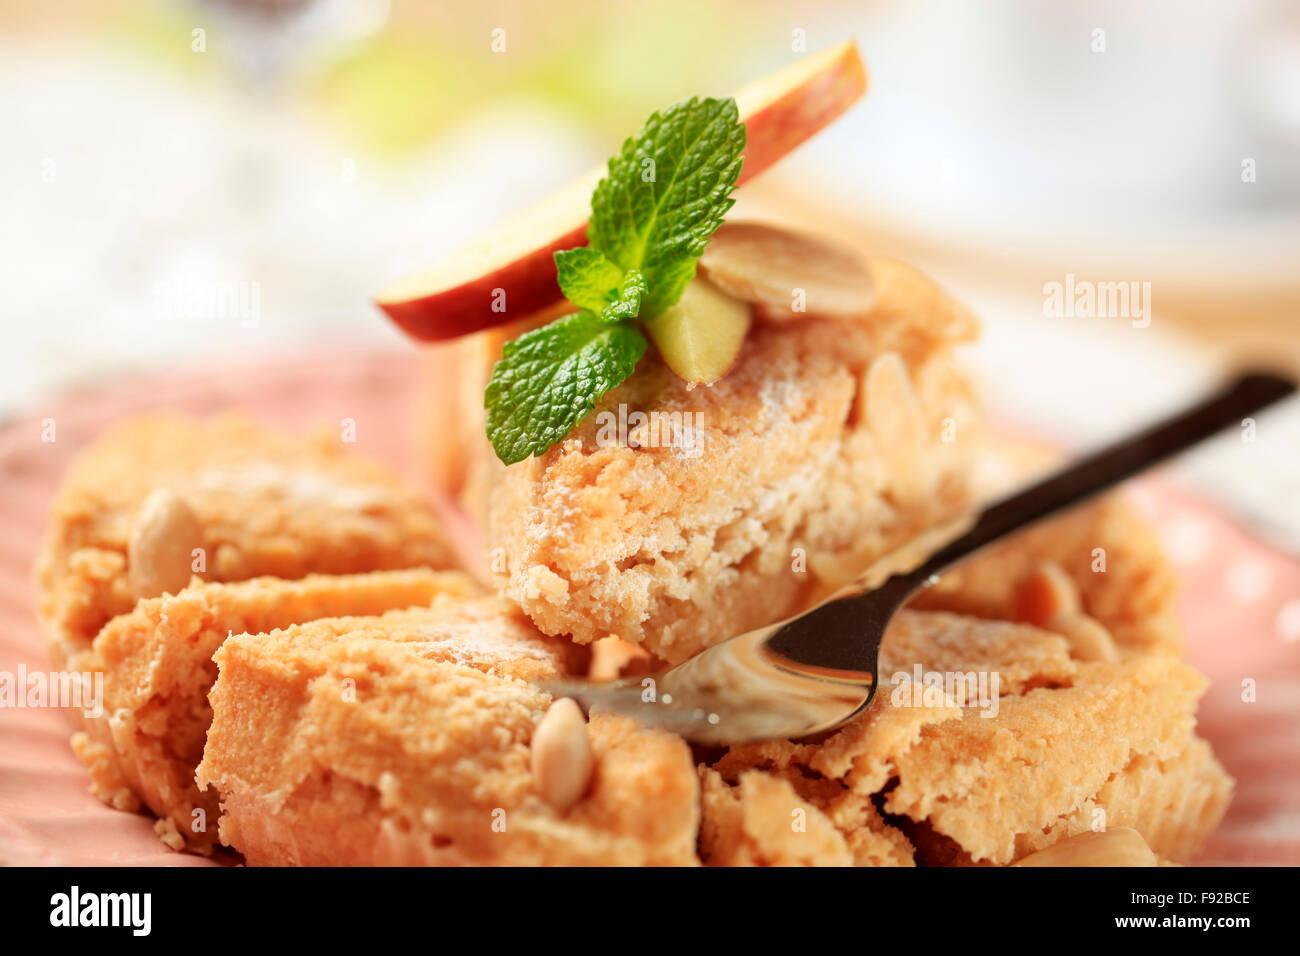 Boulangerie Pâtisserie tarte dessert amande Photo Stock